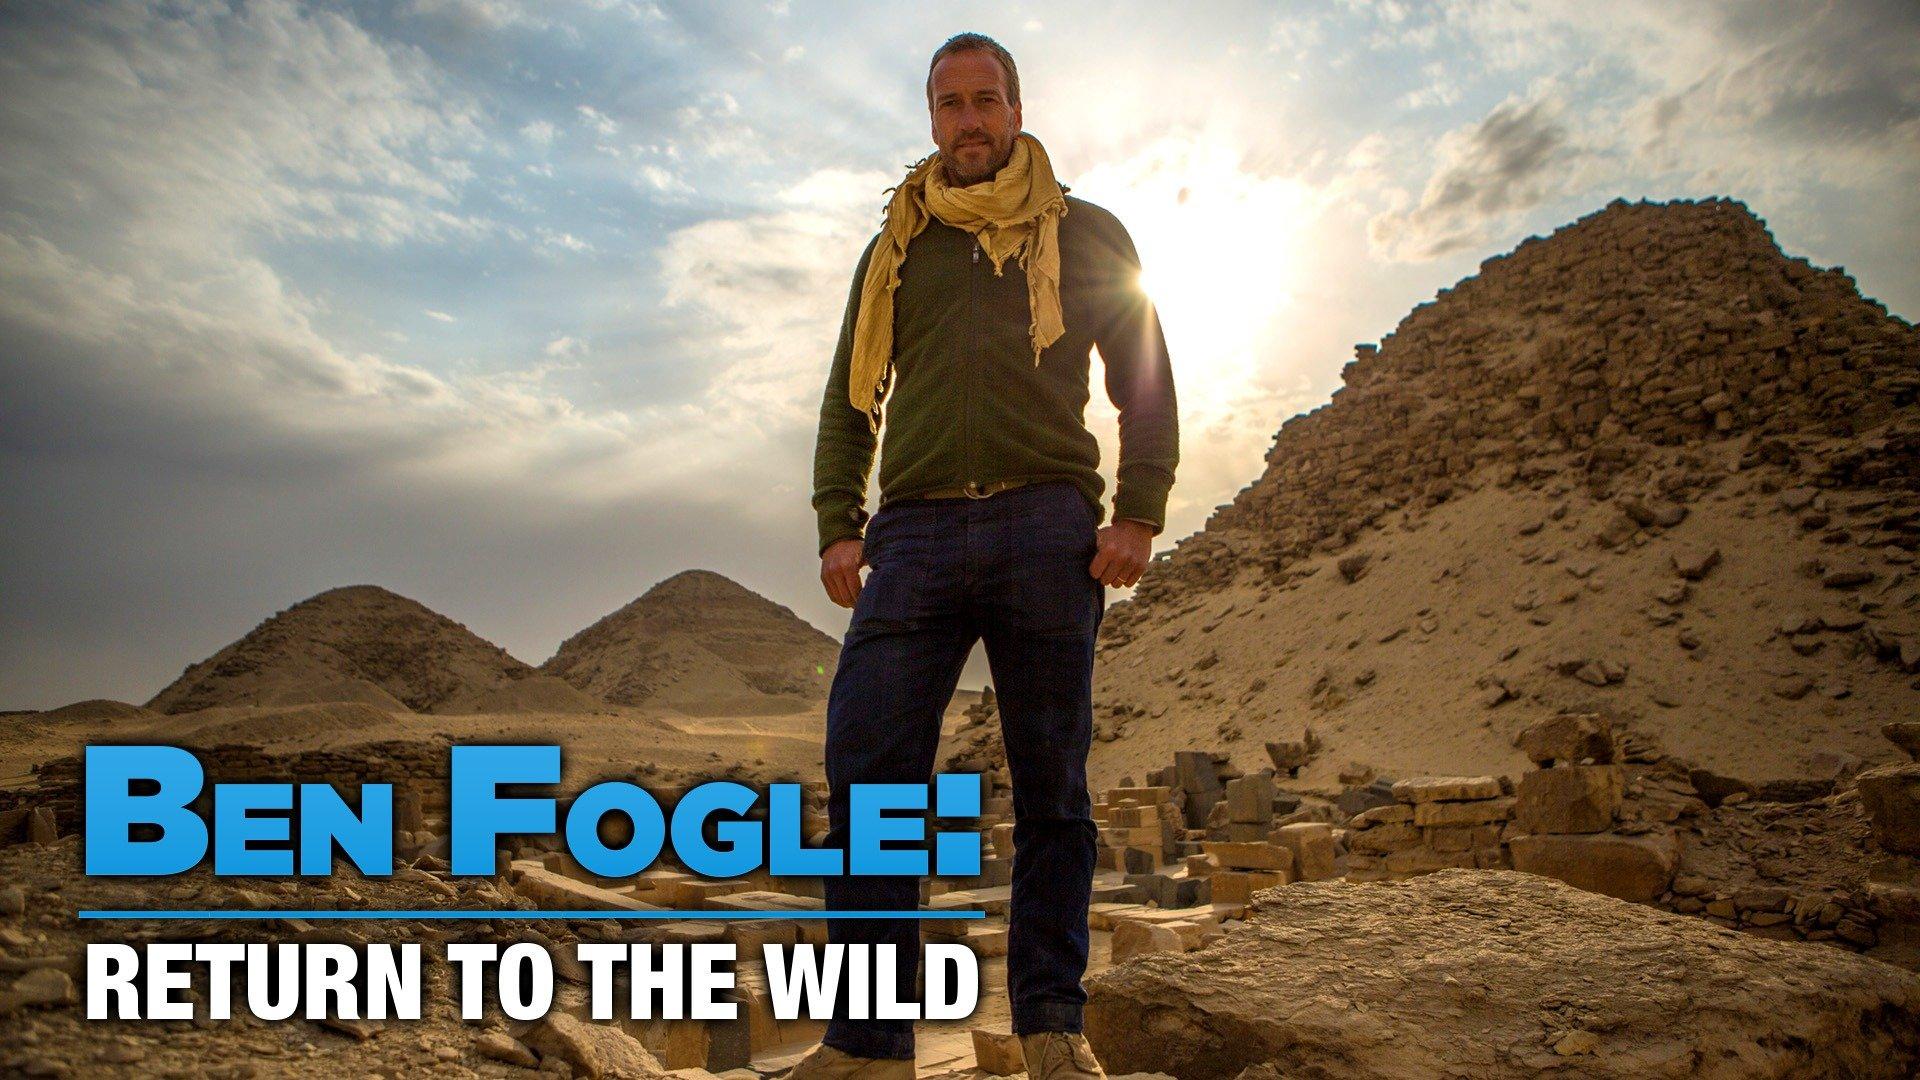 Ben Fogle: Return to the Wild